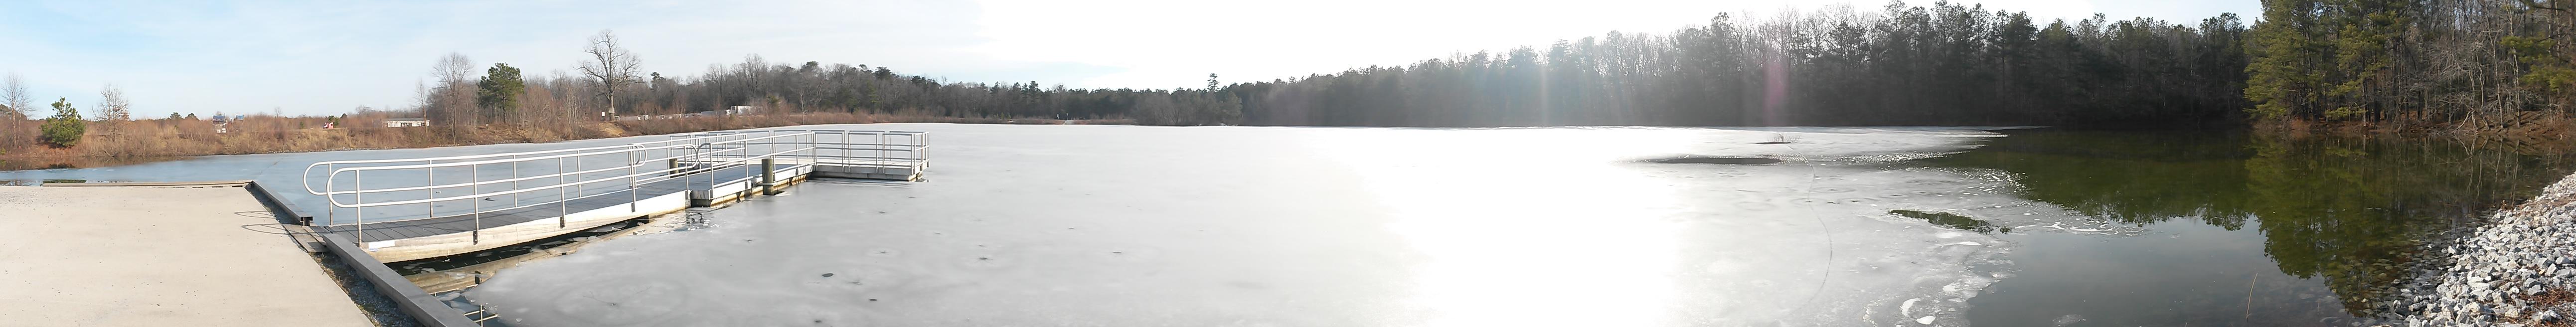 newton pond, delaware, sussex county, trout season, fishing pier